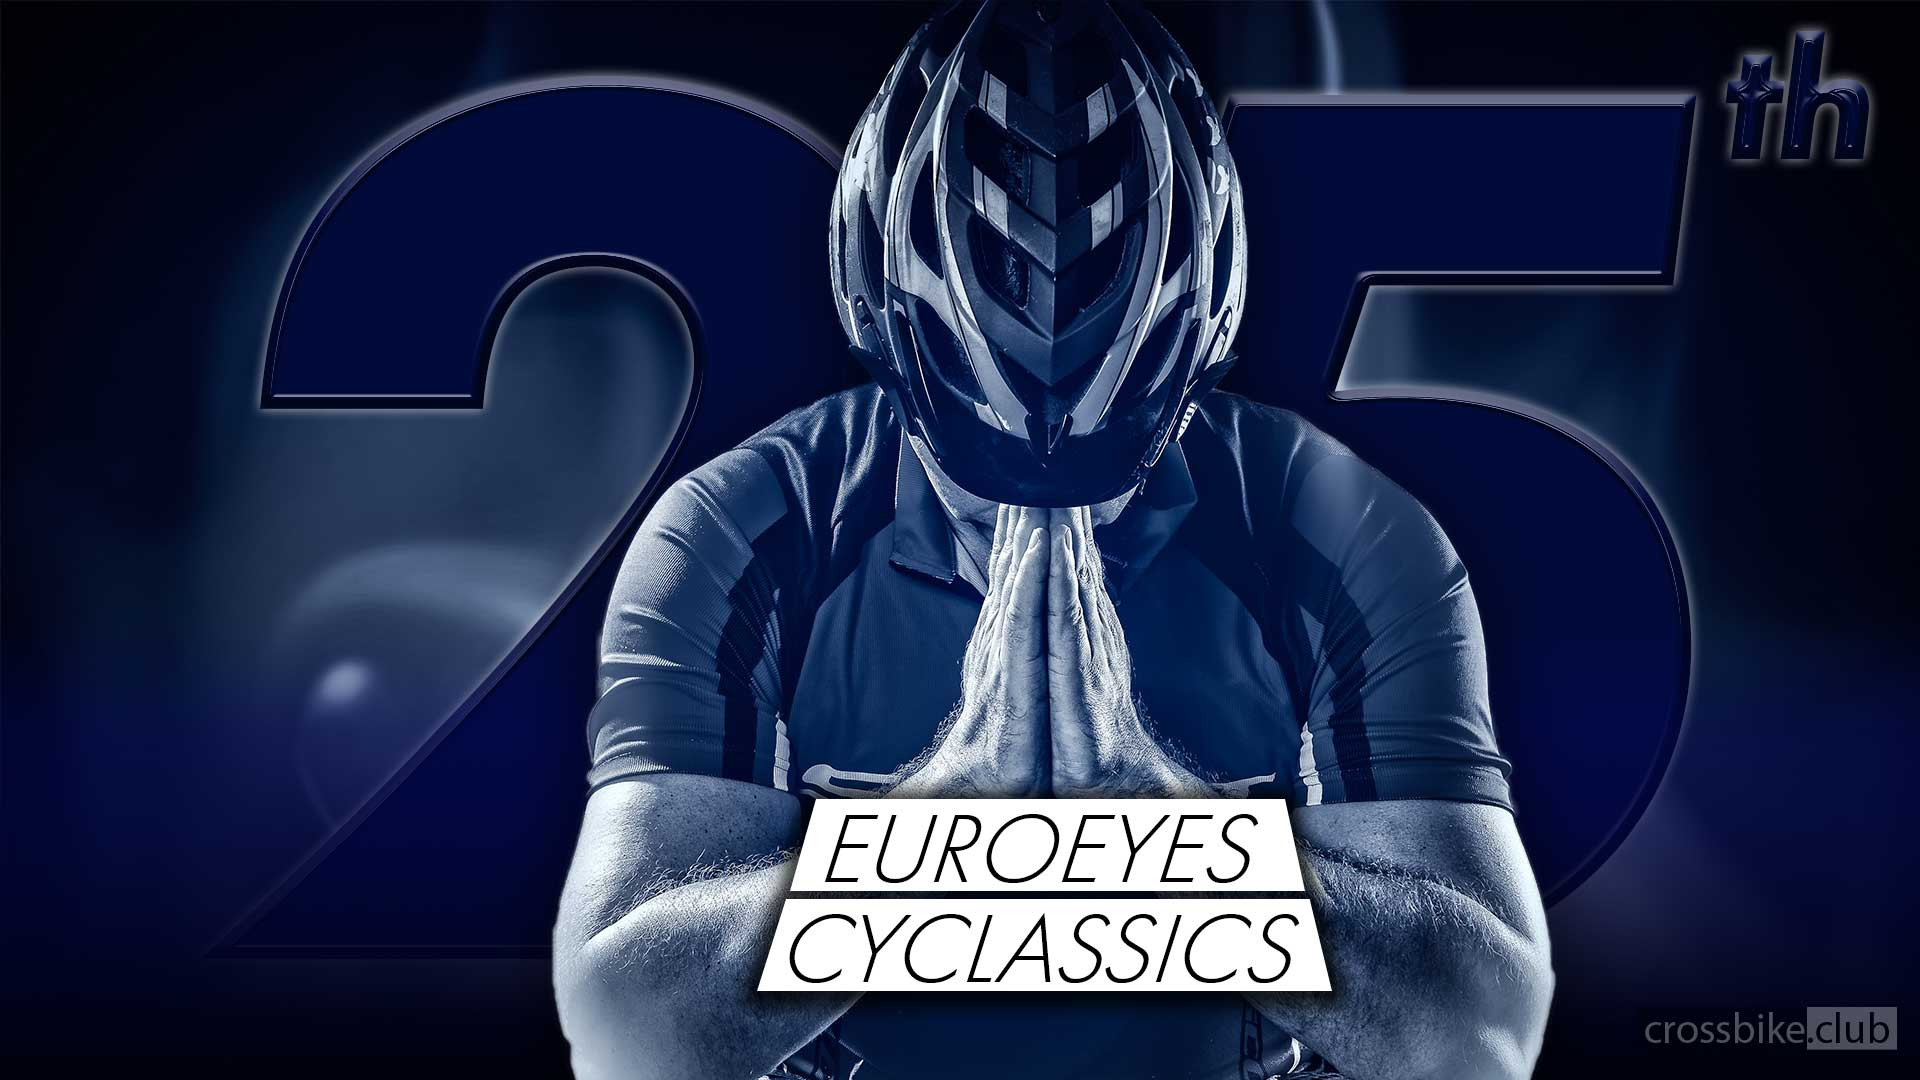 EuroEyes Cyclassics 2020